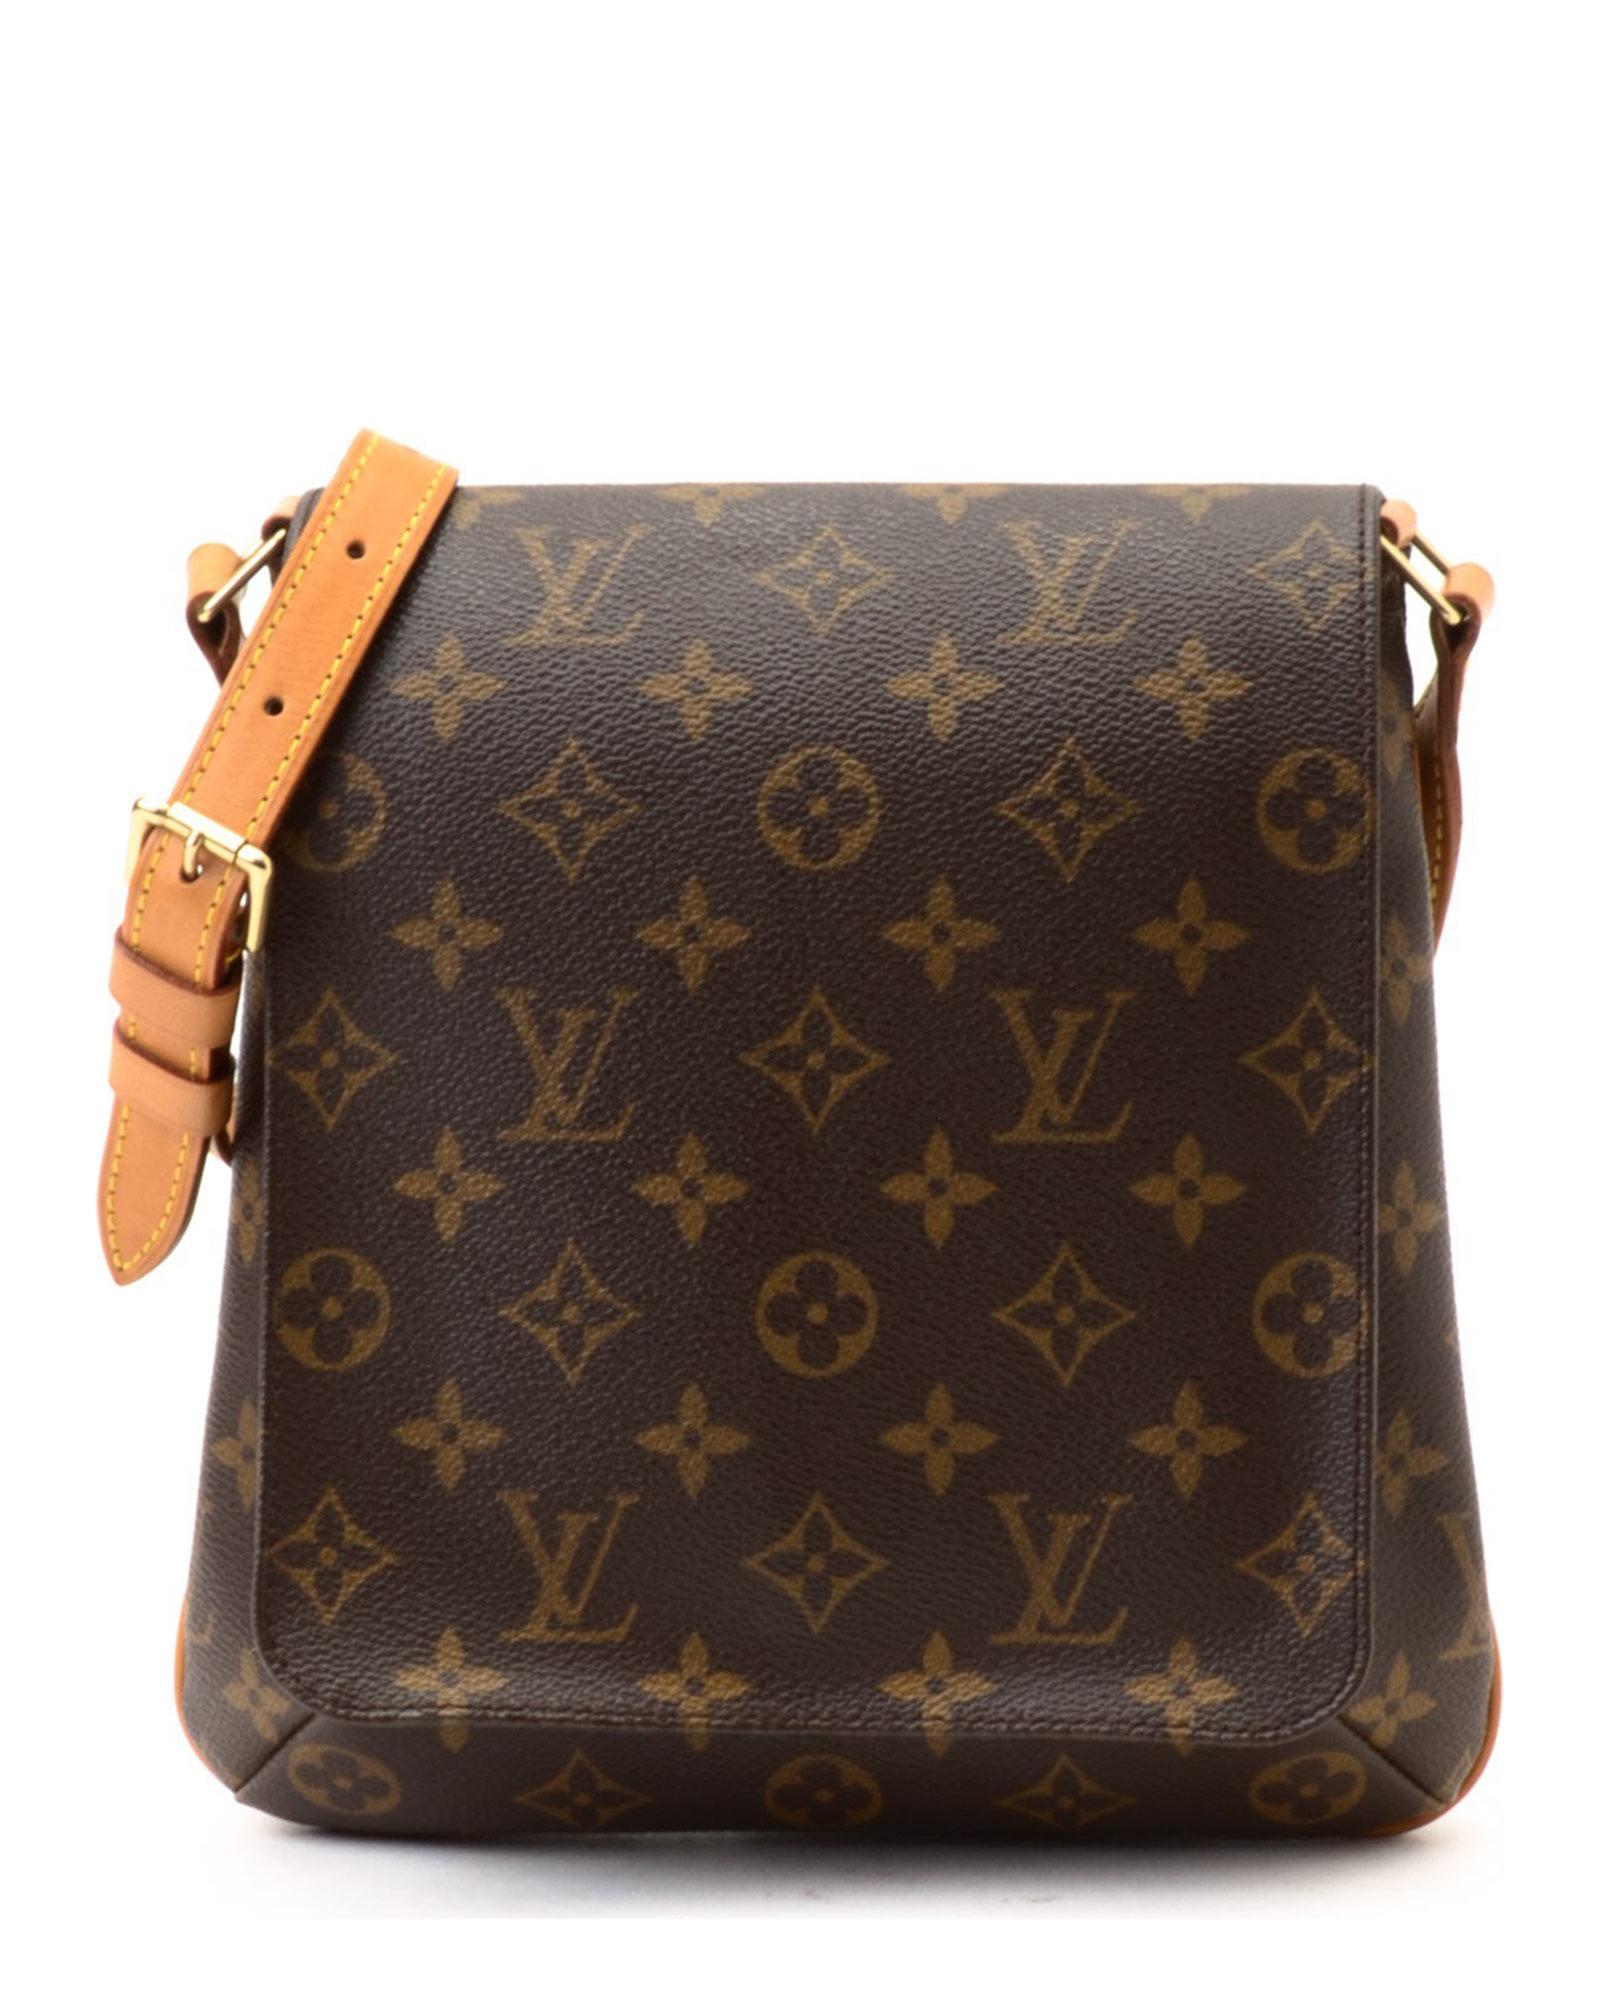 bc3ee8ed5d2d Louis Vuitton Brown Checkered Shoulder Bag